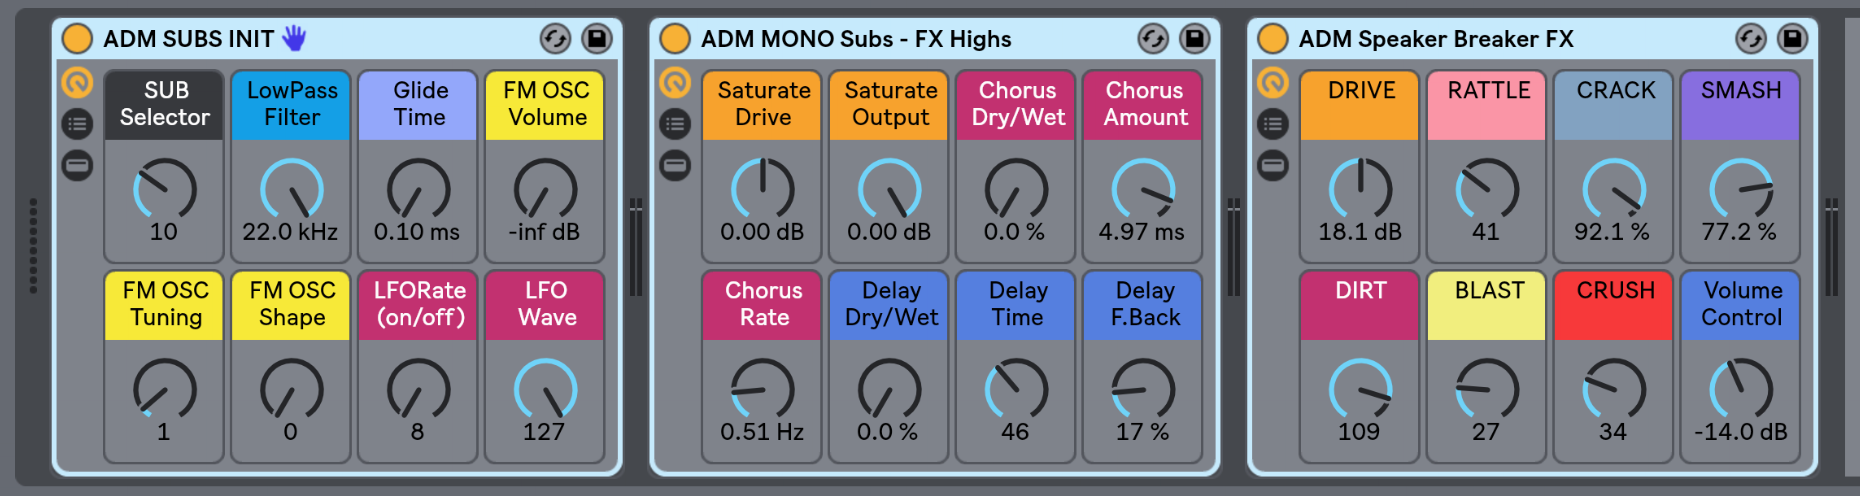 SUBS Instrument Rack and Bass Audio Effect Racks